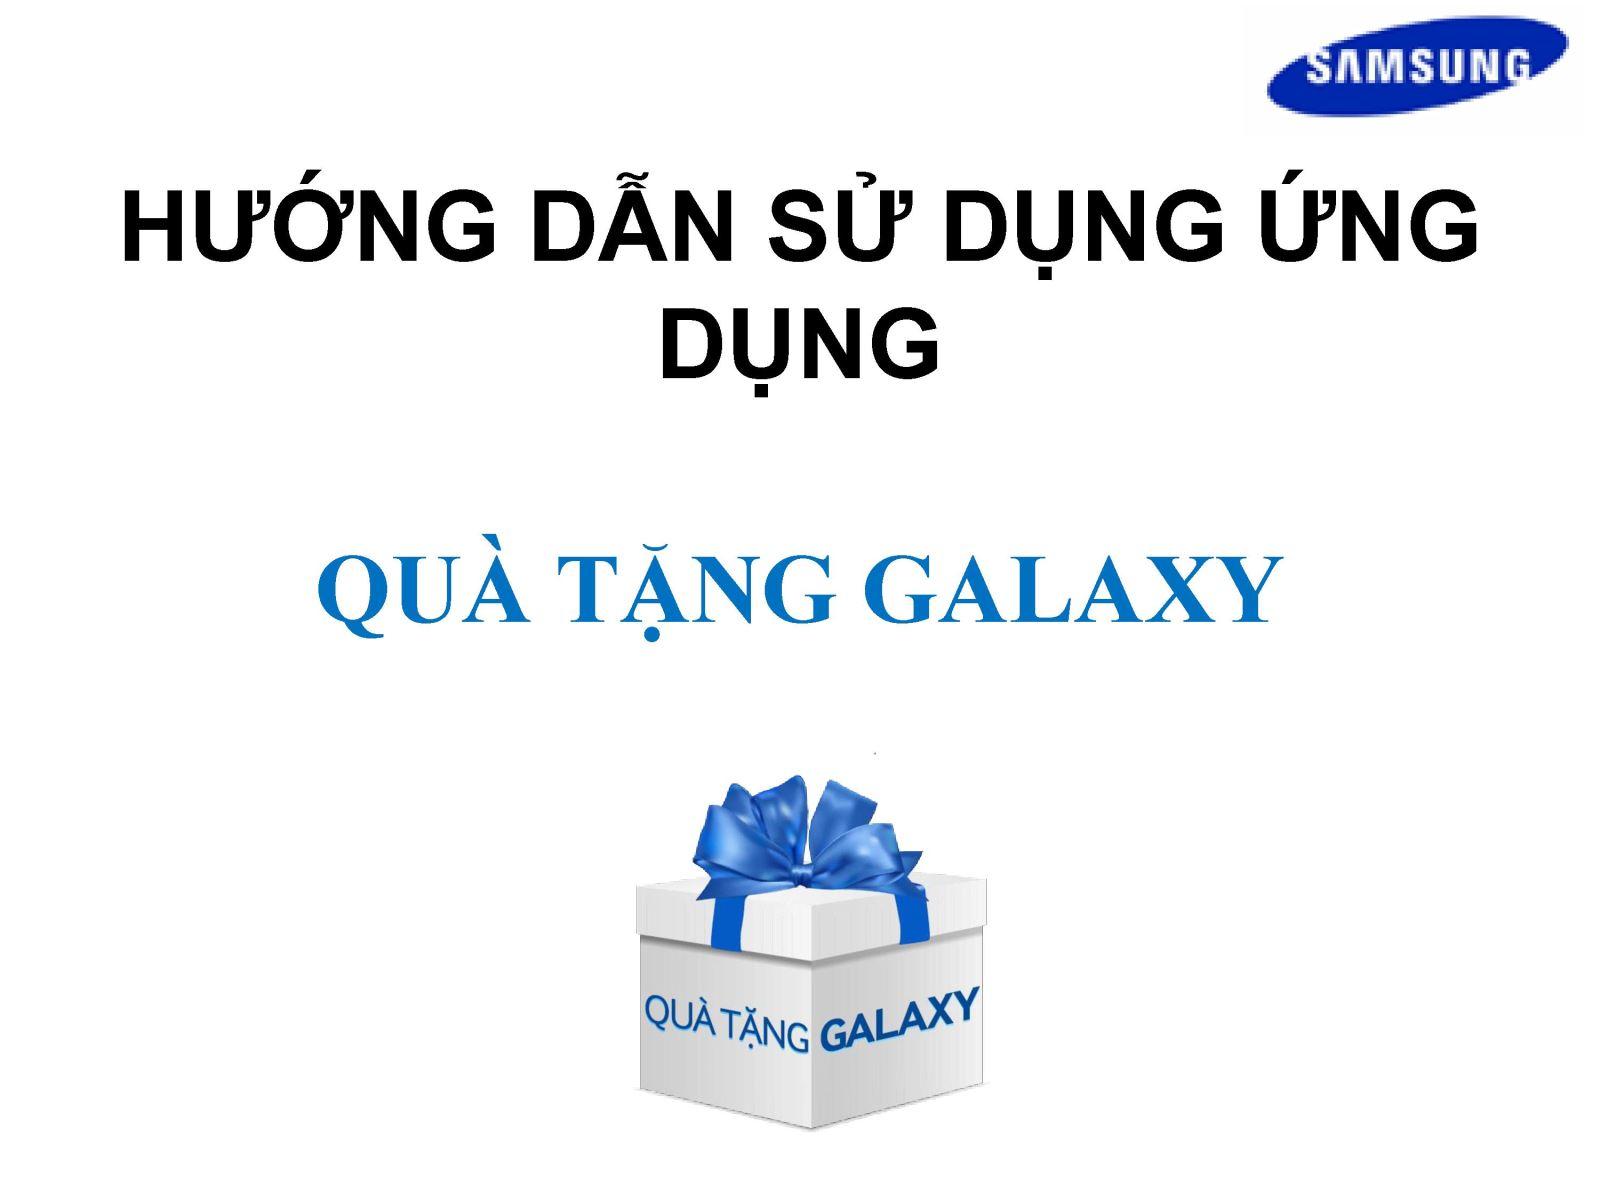 Giảm trực tiếp 2,5 Triệu khi mua Galaxy Note9 qua ứng dụng Galaxy hình 1